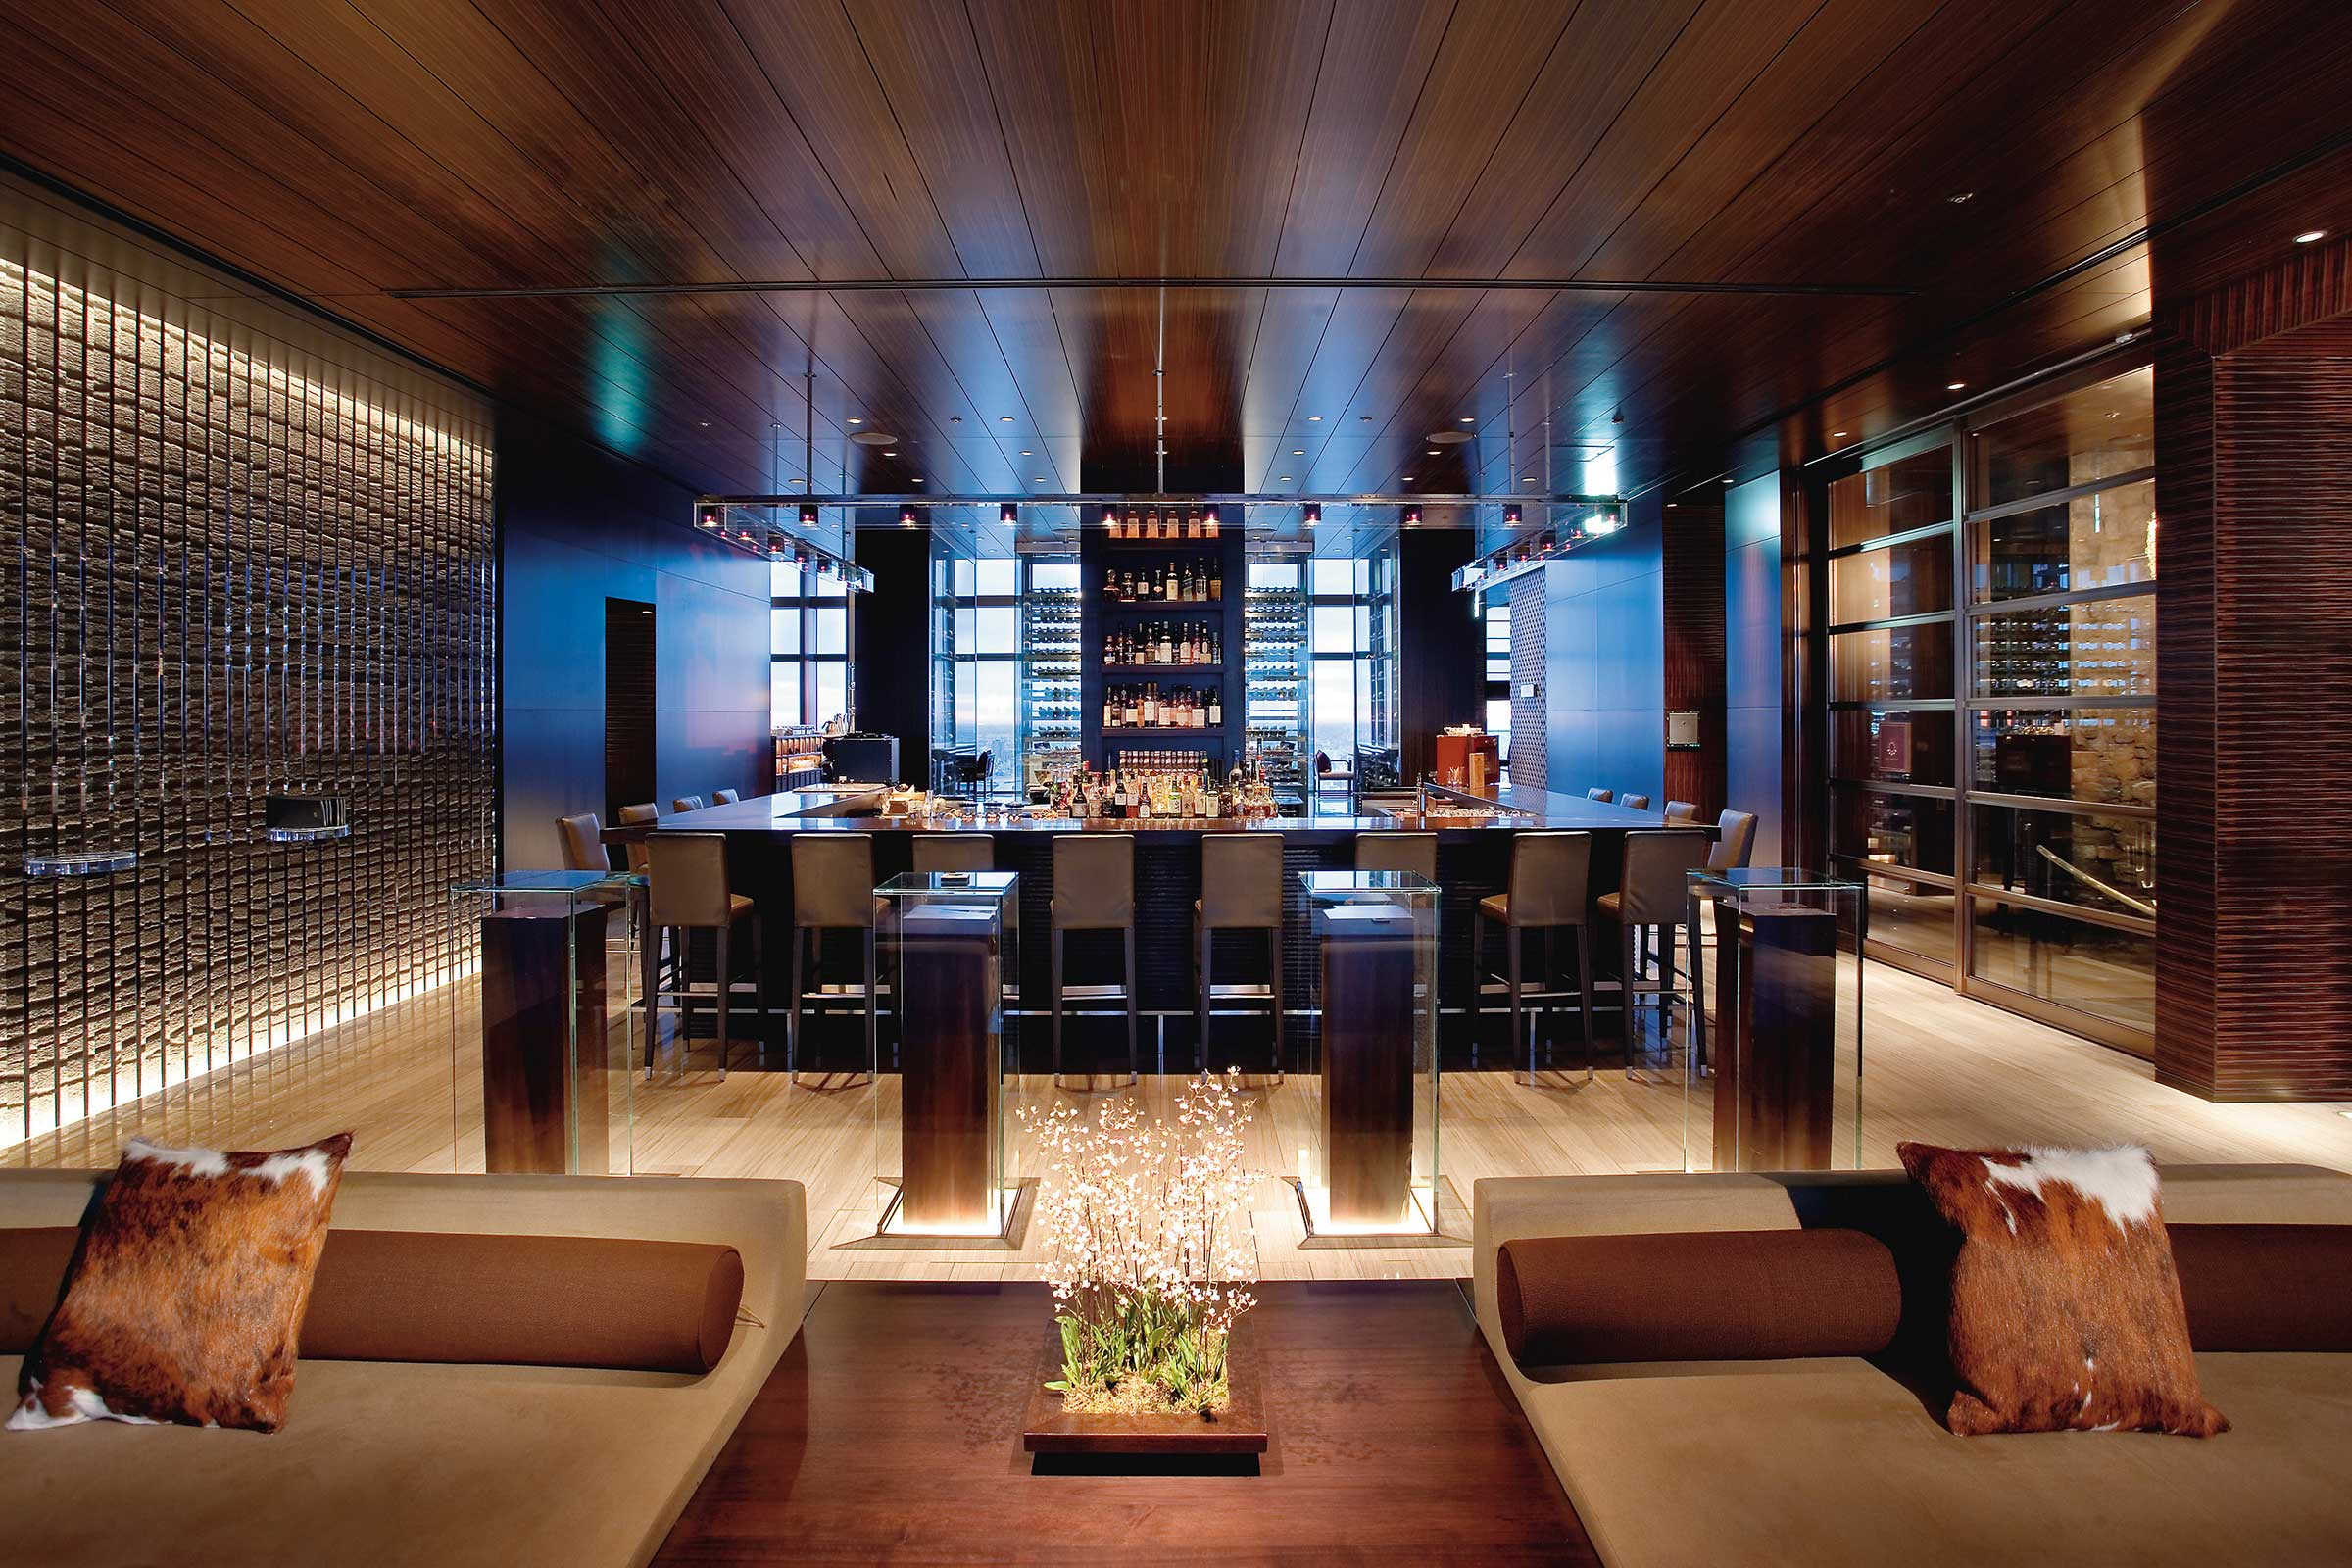 tokyo-restaurant-mandarin-bar-01.jpg